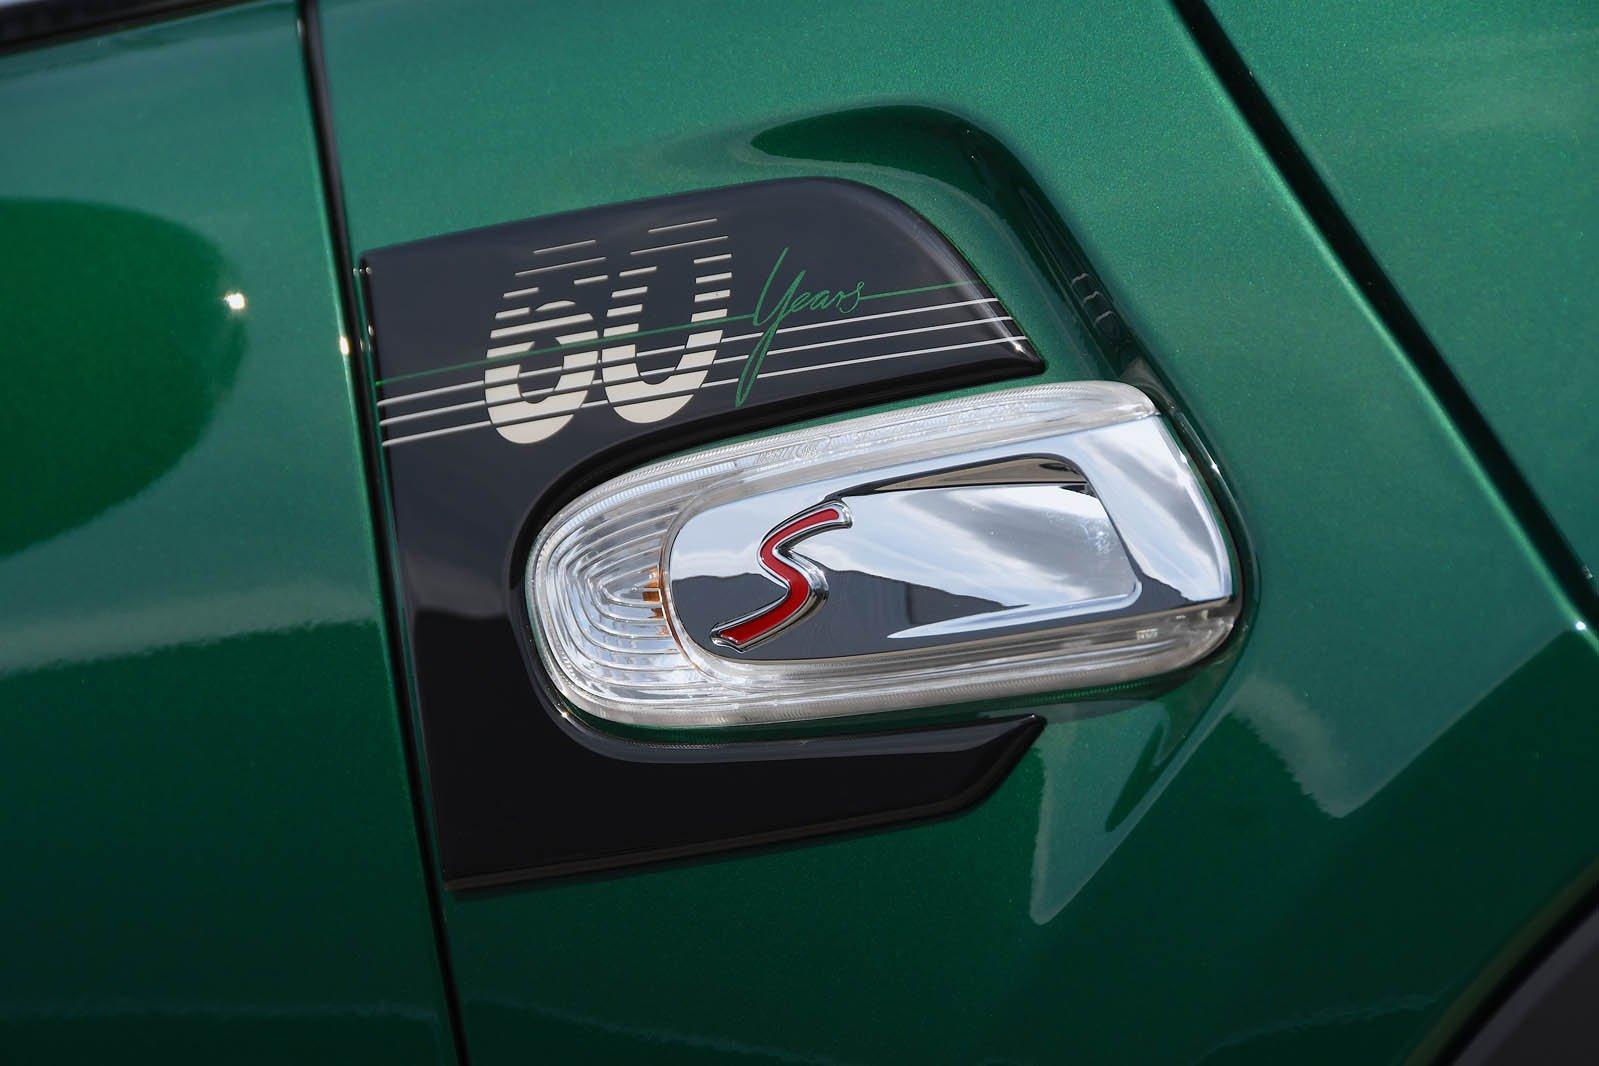 Mini Cooper S 60 Year emblem